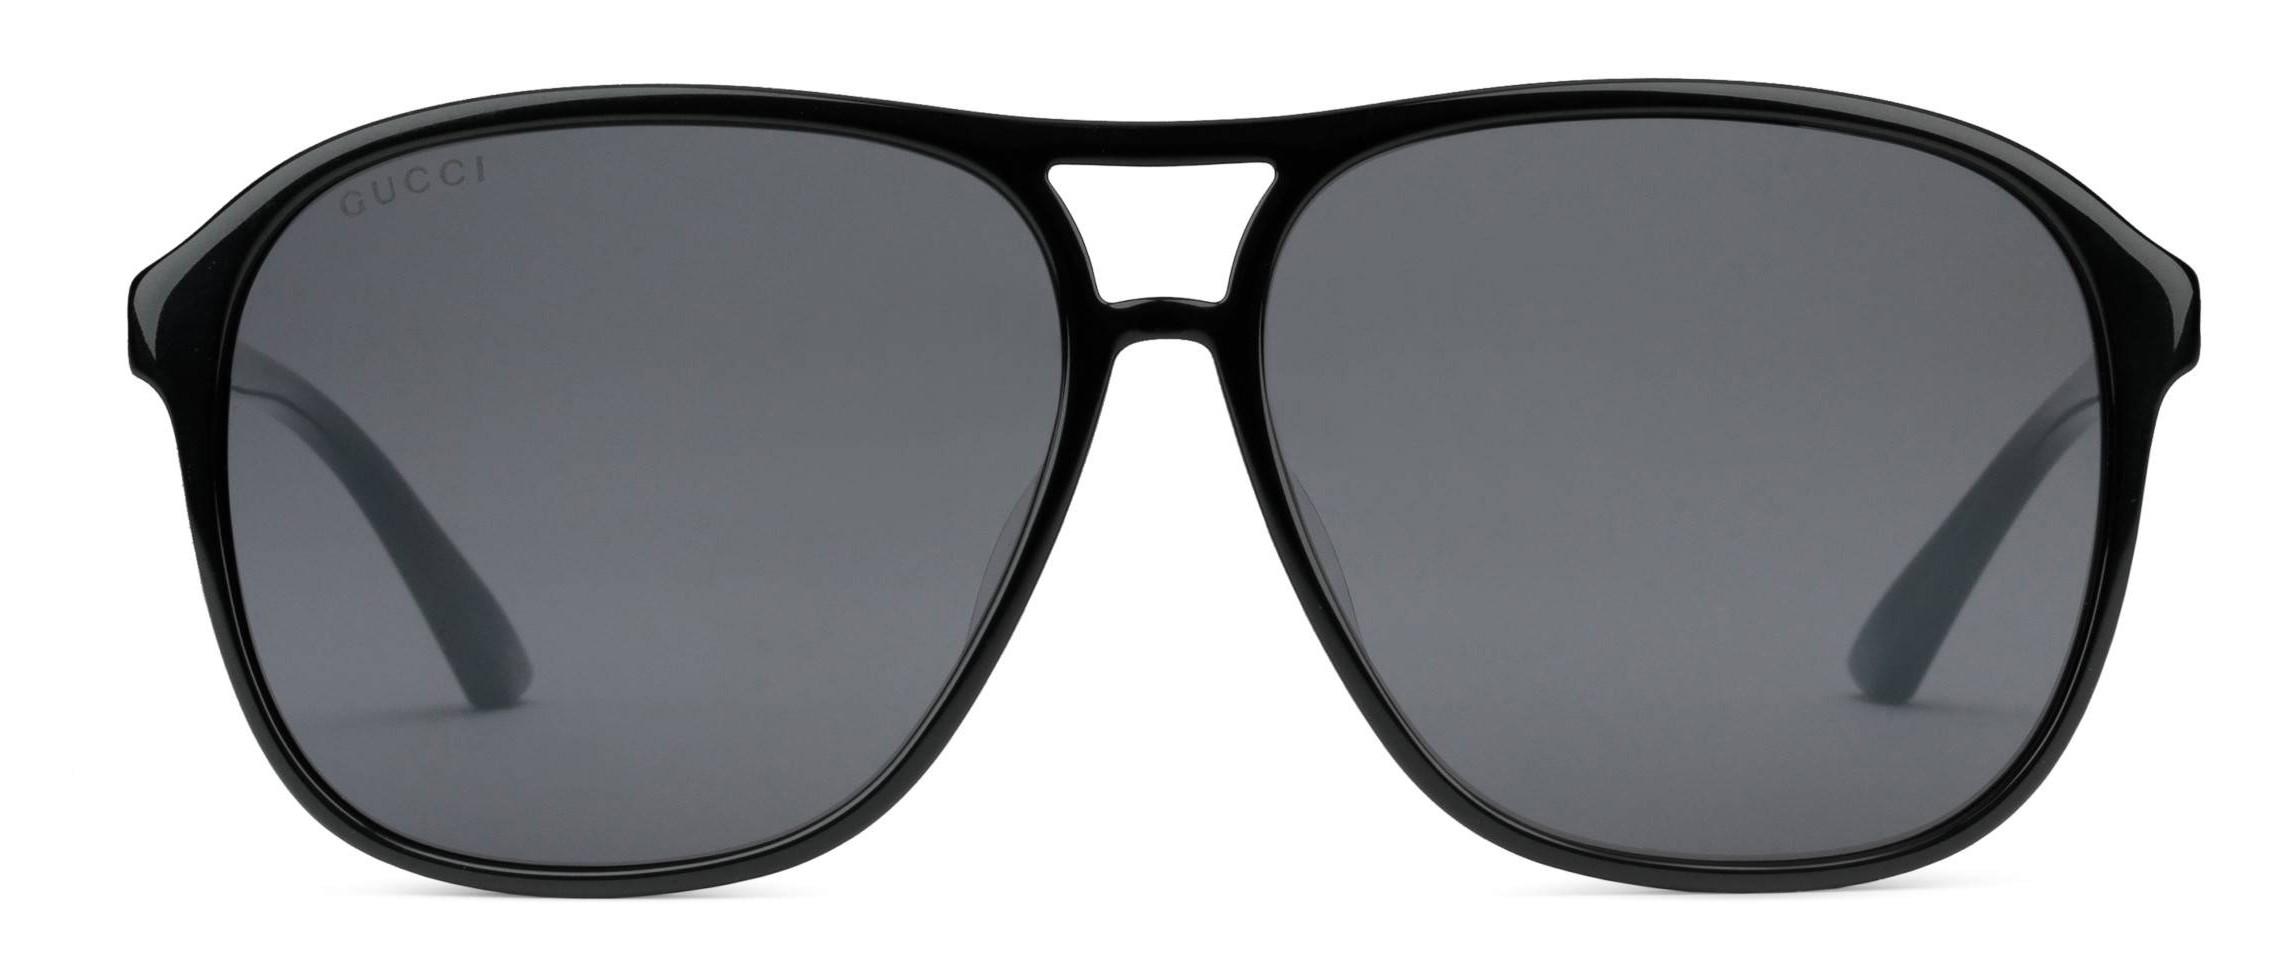 450430f325a7 Gucci - Acetate Aviator Sunglasses with Optimal Fit - Acetate Black Lenses  Grey - Gucci Eyewear